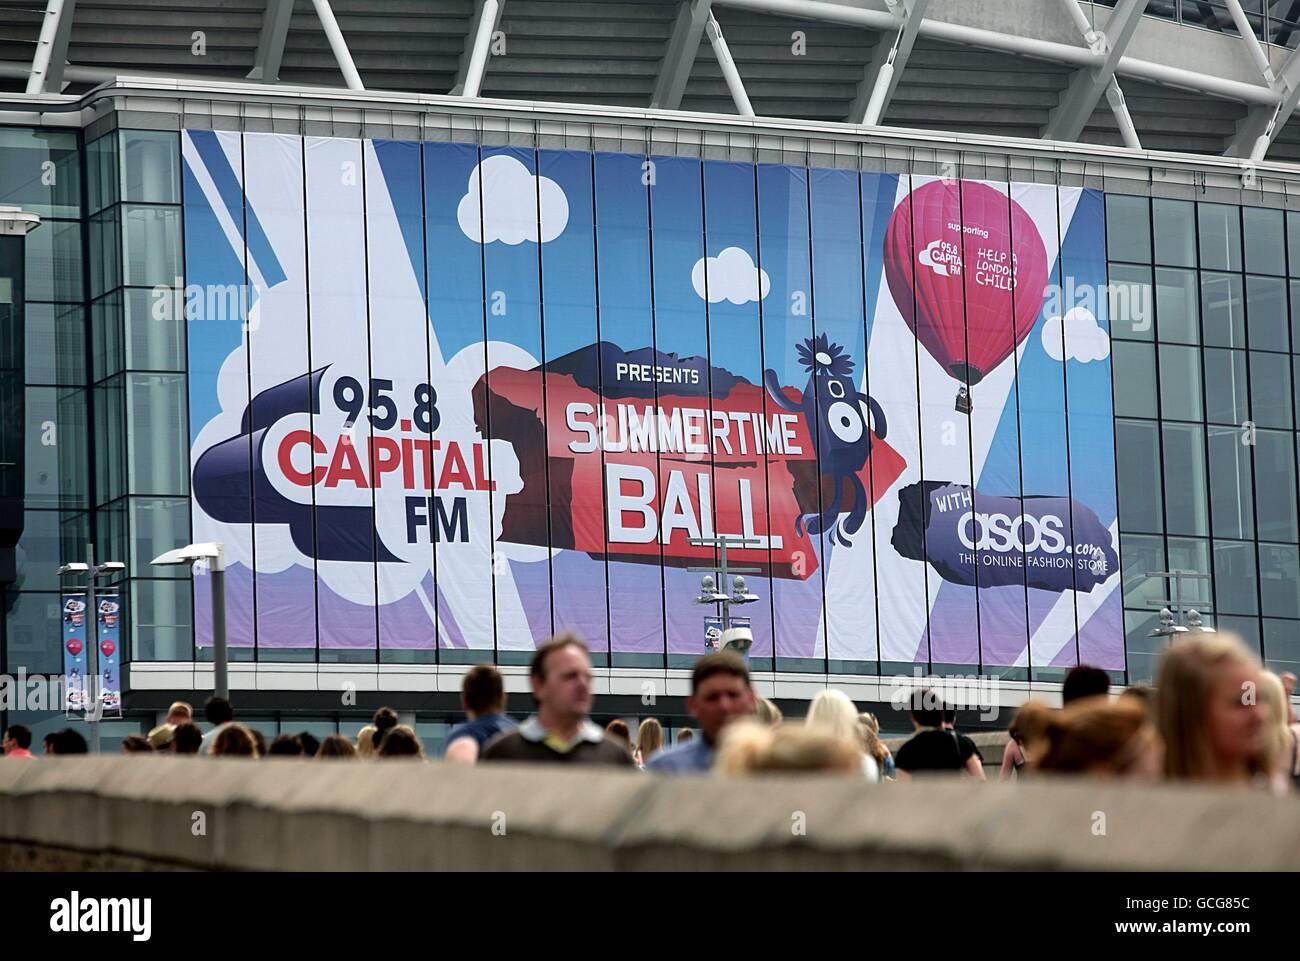 Capital Radio Summertime Ball - London - Stock Image